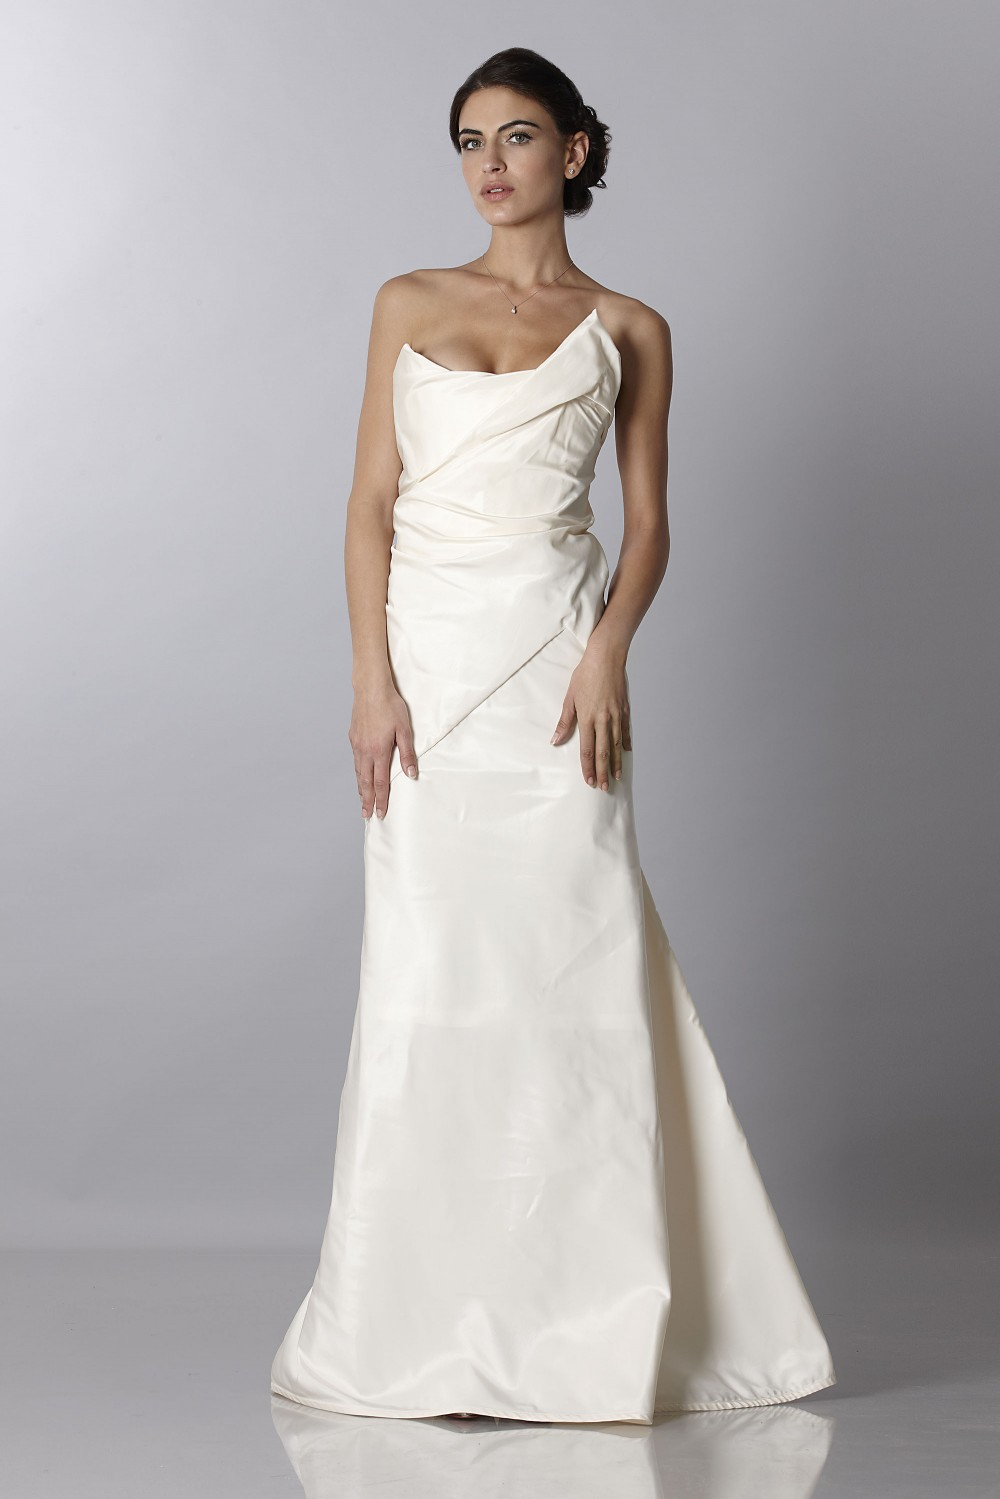 Wedding bustier dress